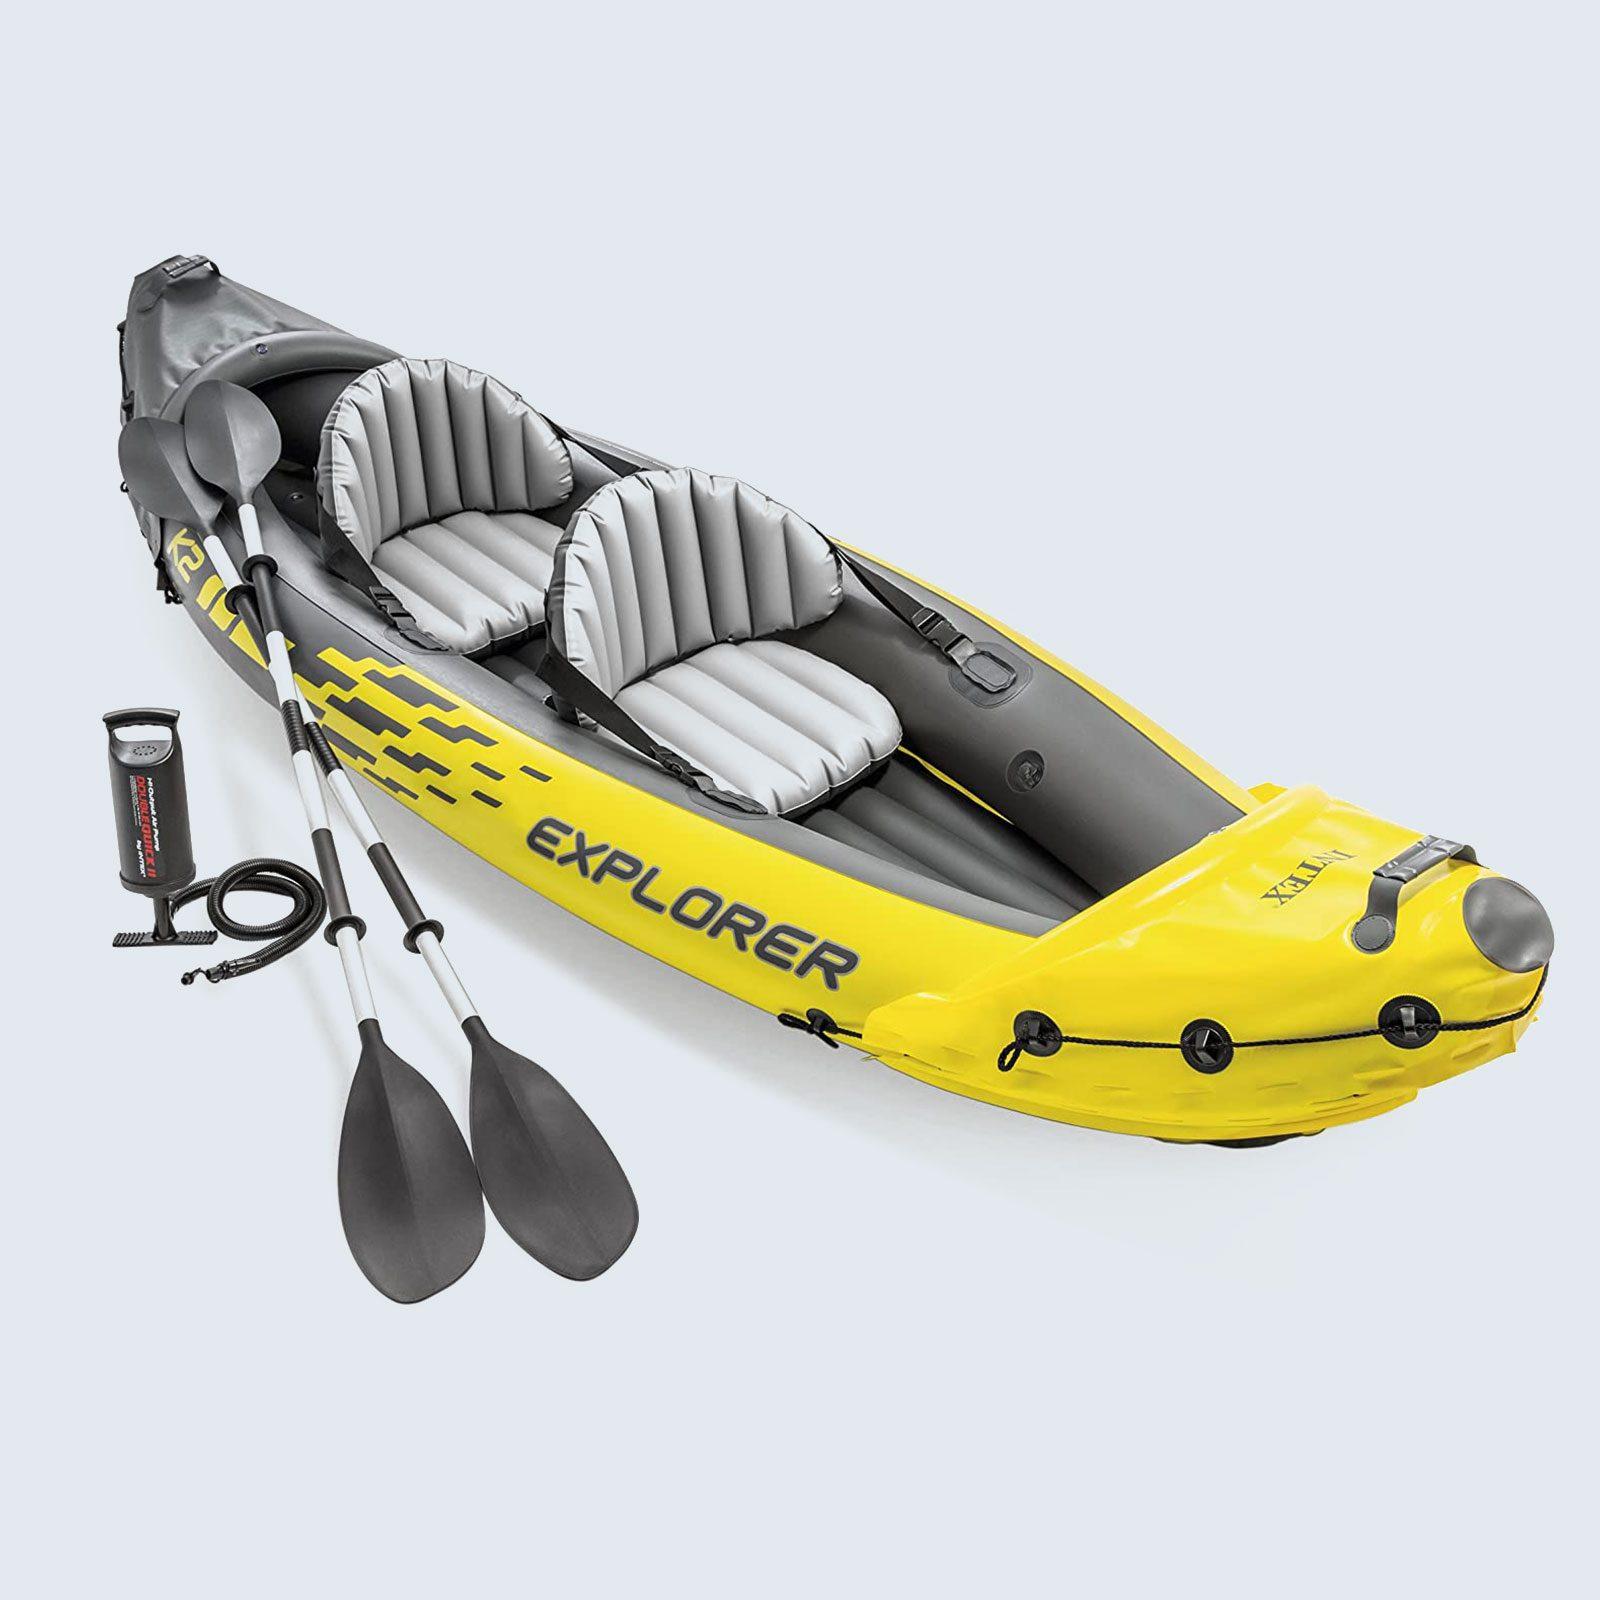 For the outdoor adventurer: Intex Explorer K2 Inflatable Kayak